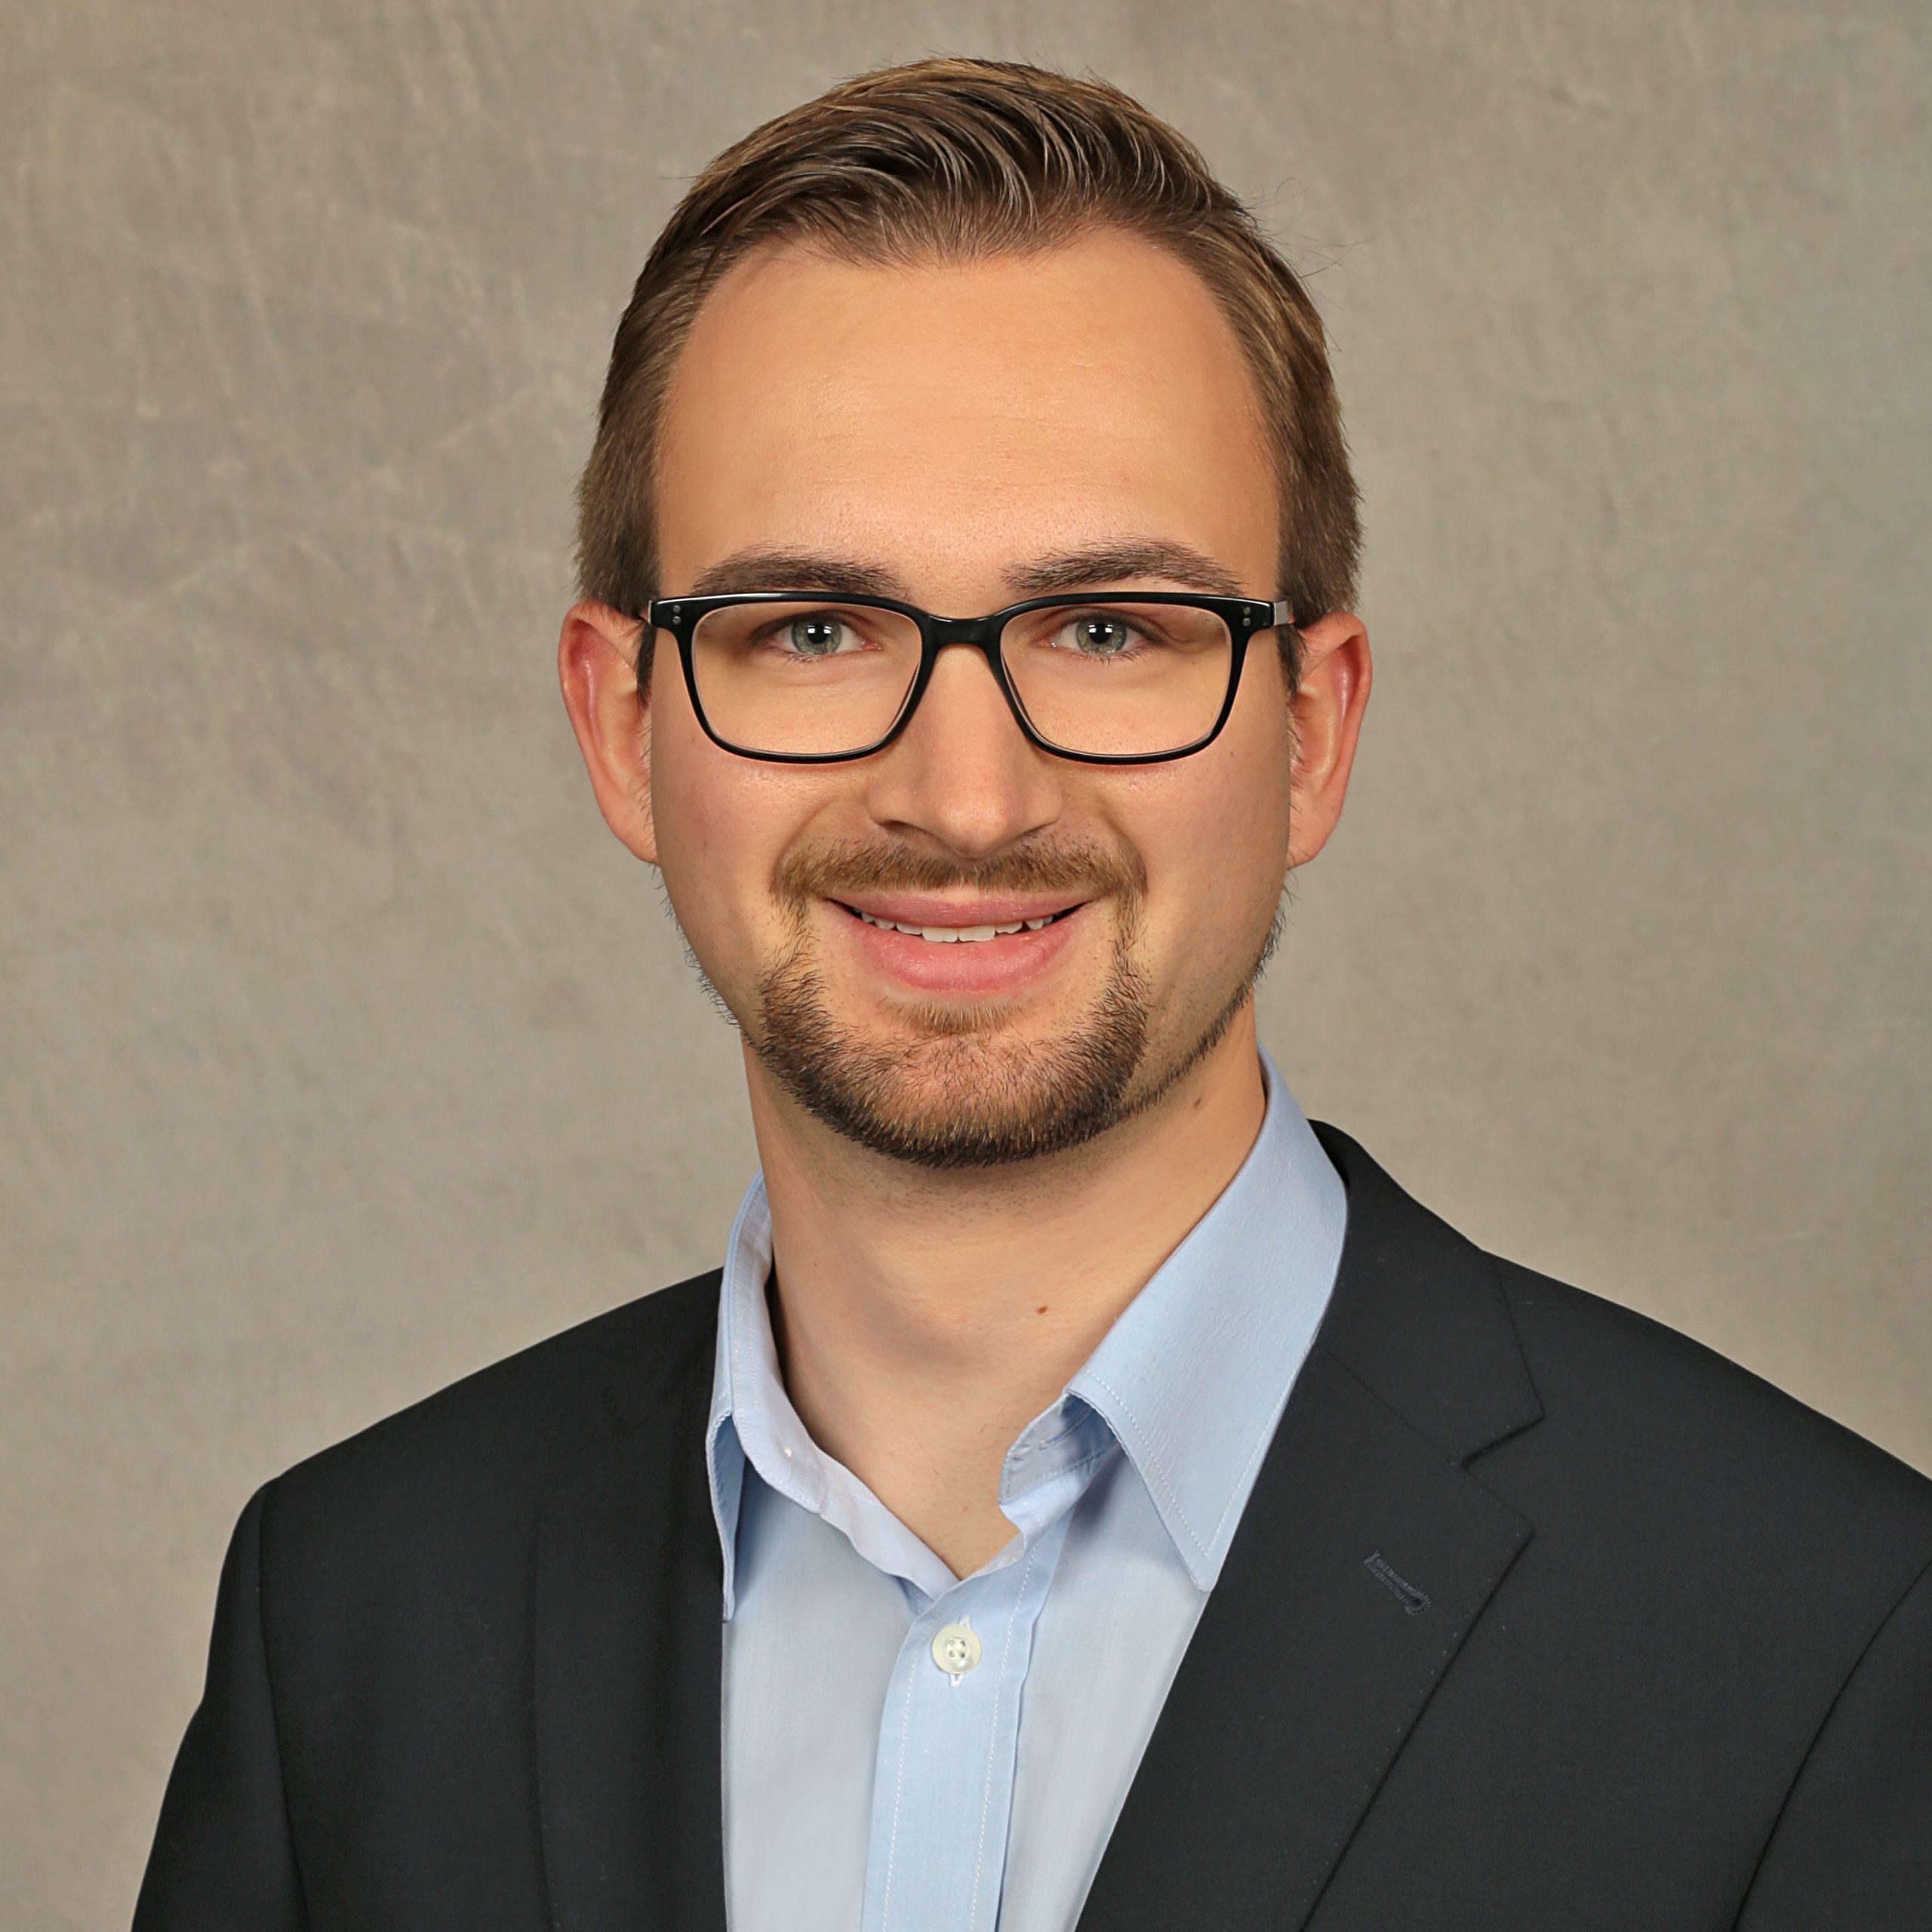 Mike Schmillenkamp